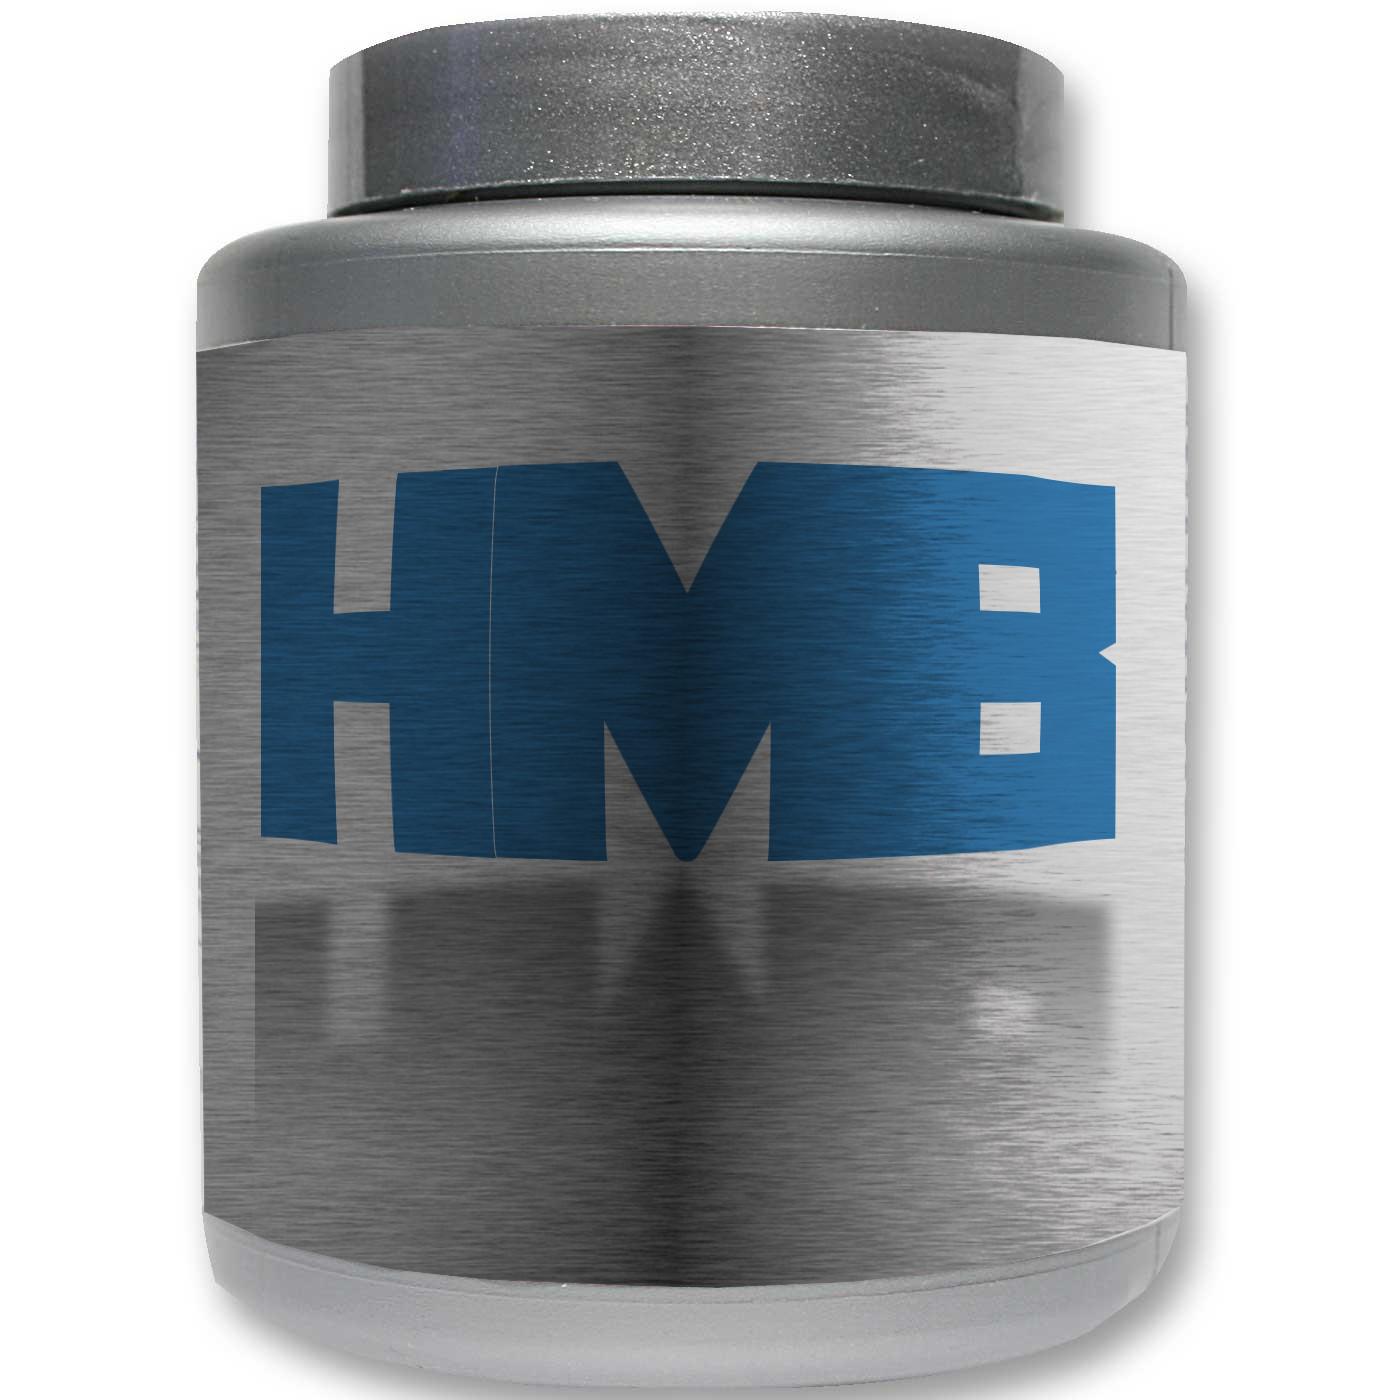 HMB - oszustwo w puszce